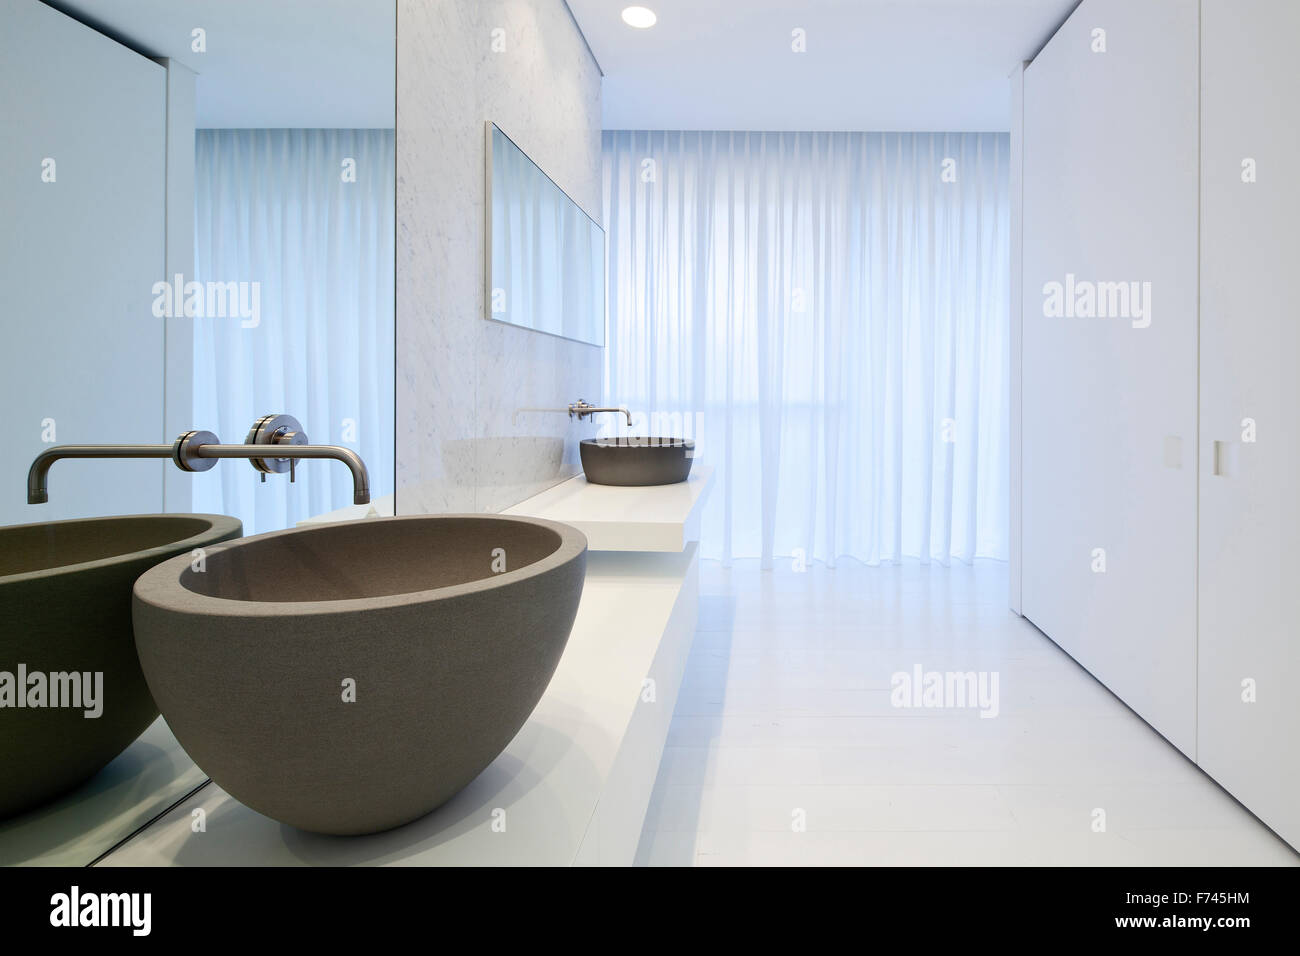 Double Basins Stock Photos & Double Basins Stock Images - Alamy